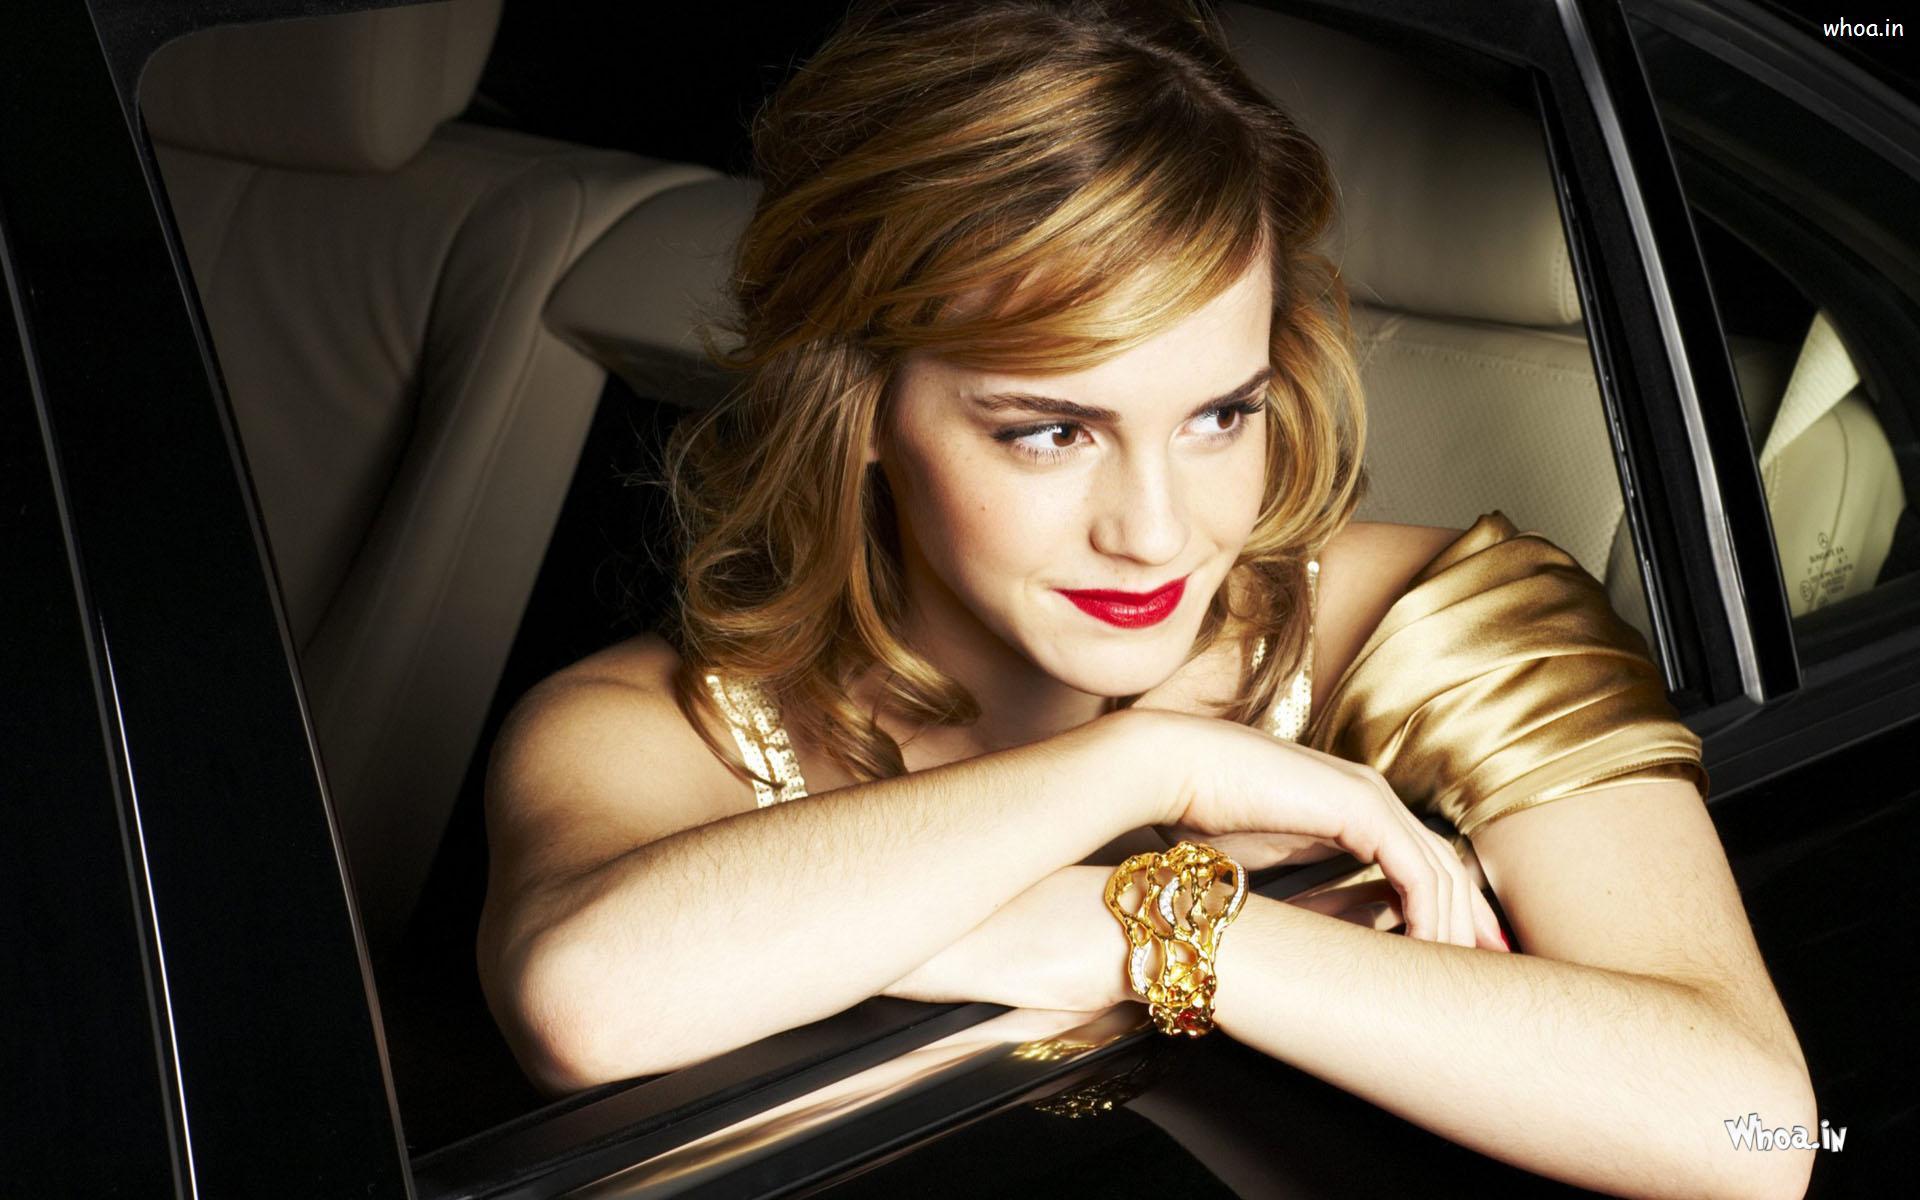 Beautiful Emma Watson In Car